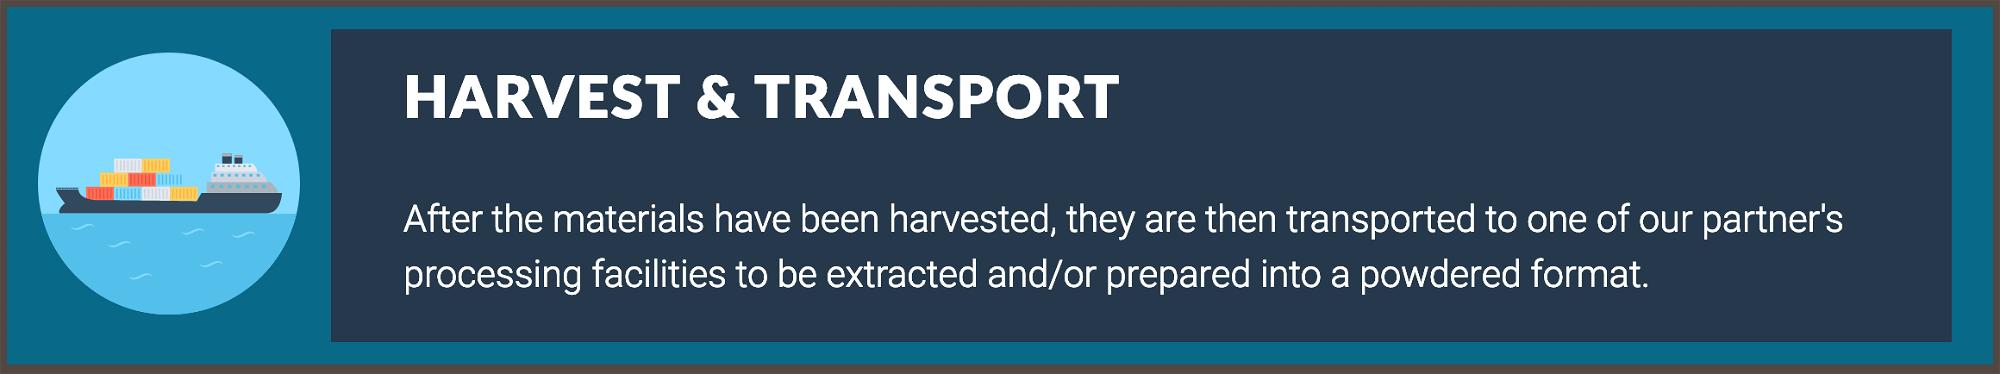 Brain Forza Harvest, transport